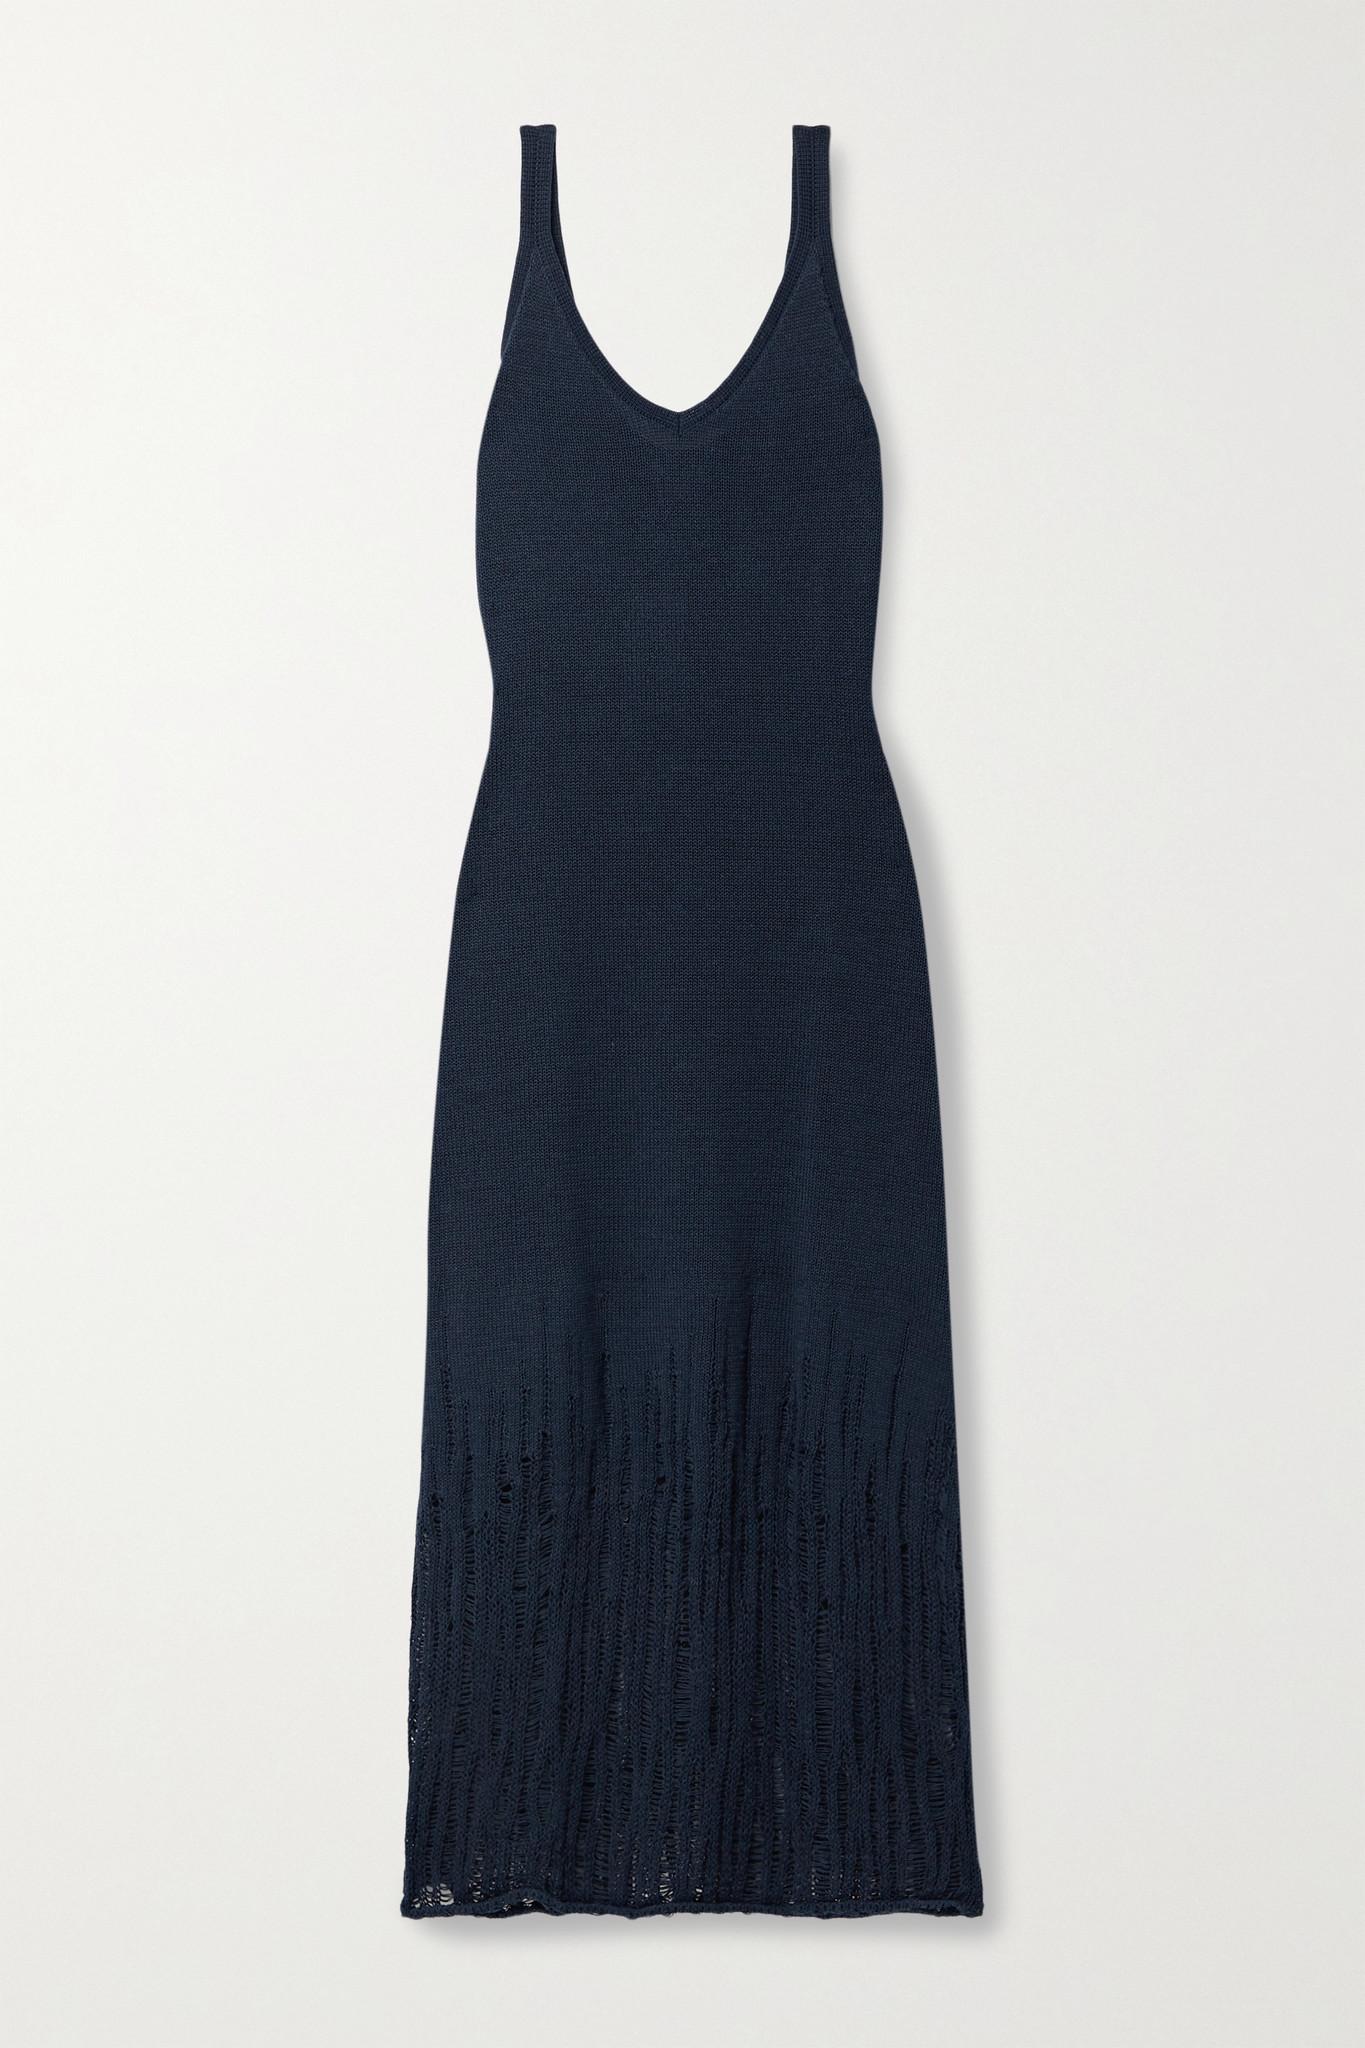 JASON WU - 针织中长连衣裙 - 蓝色 - large